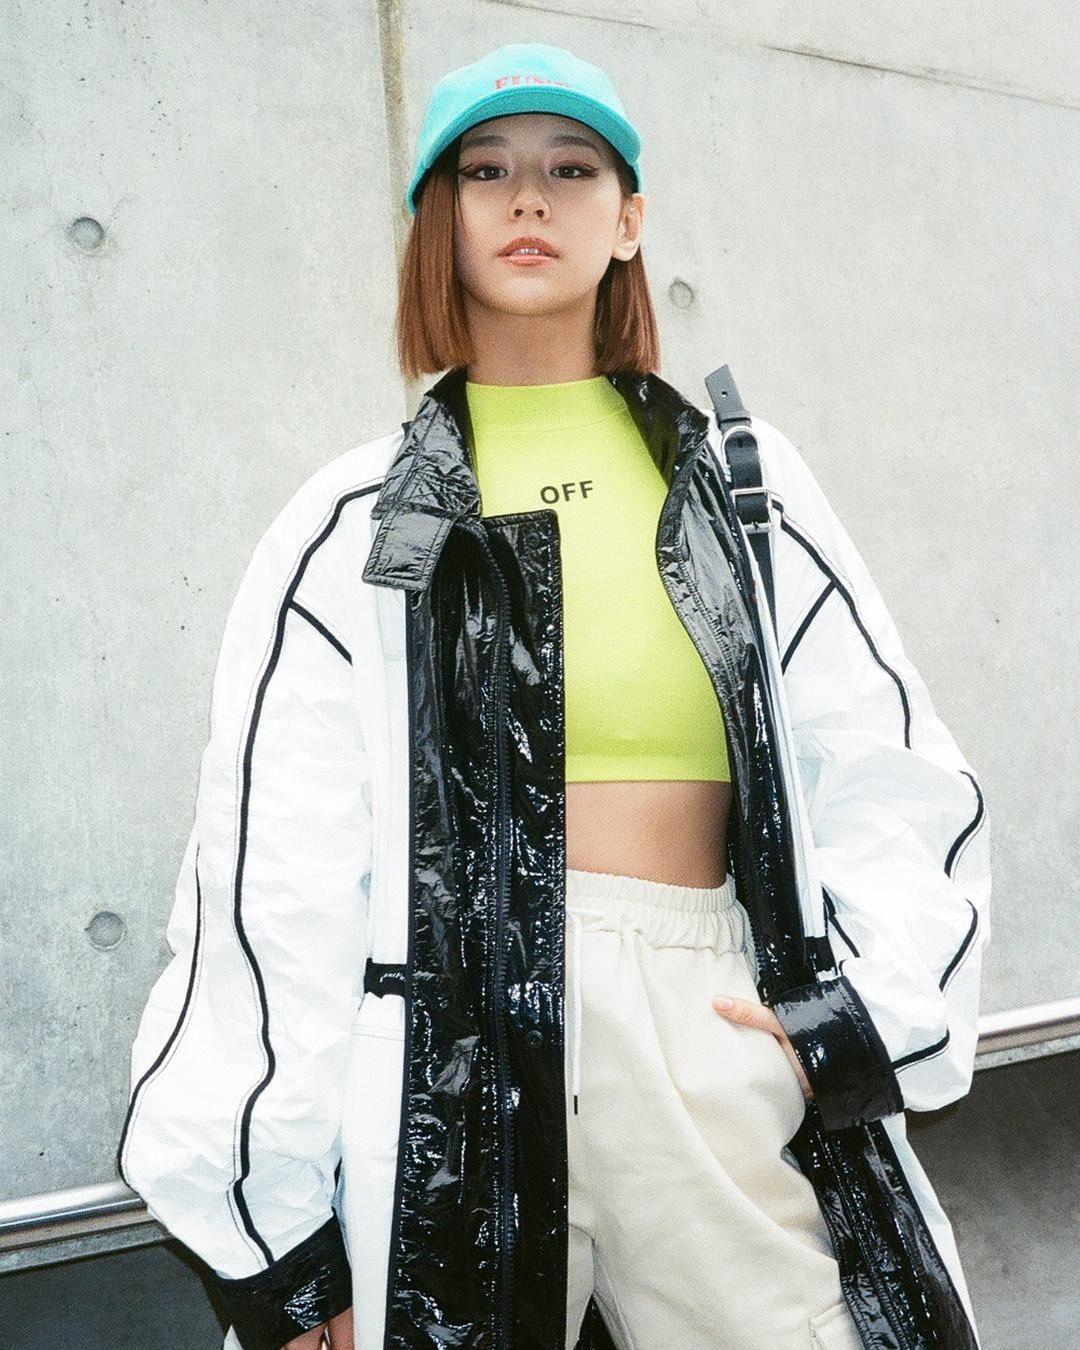 yurie horie mặc áo khoác oversize off white phong cách thời trang streetwear